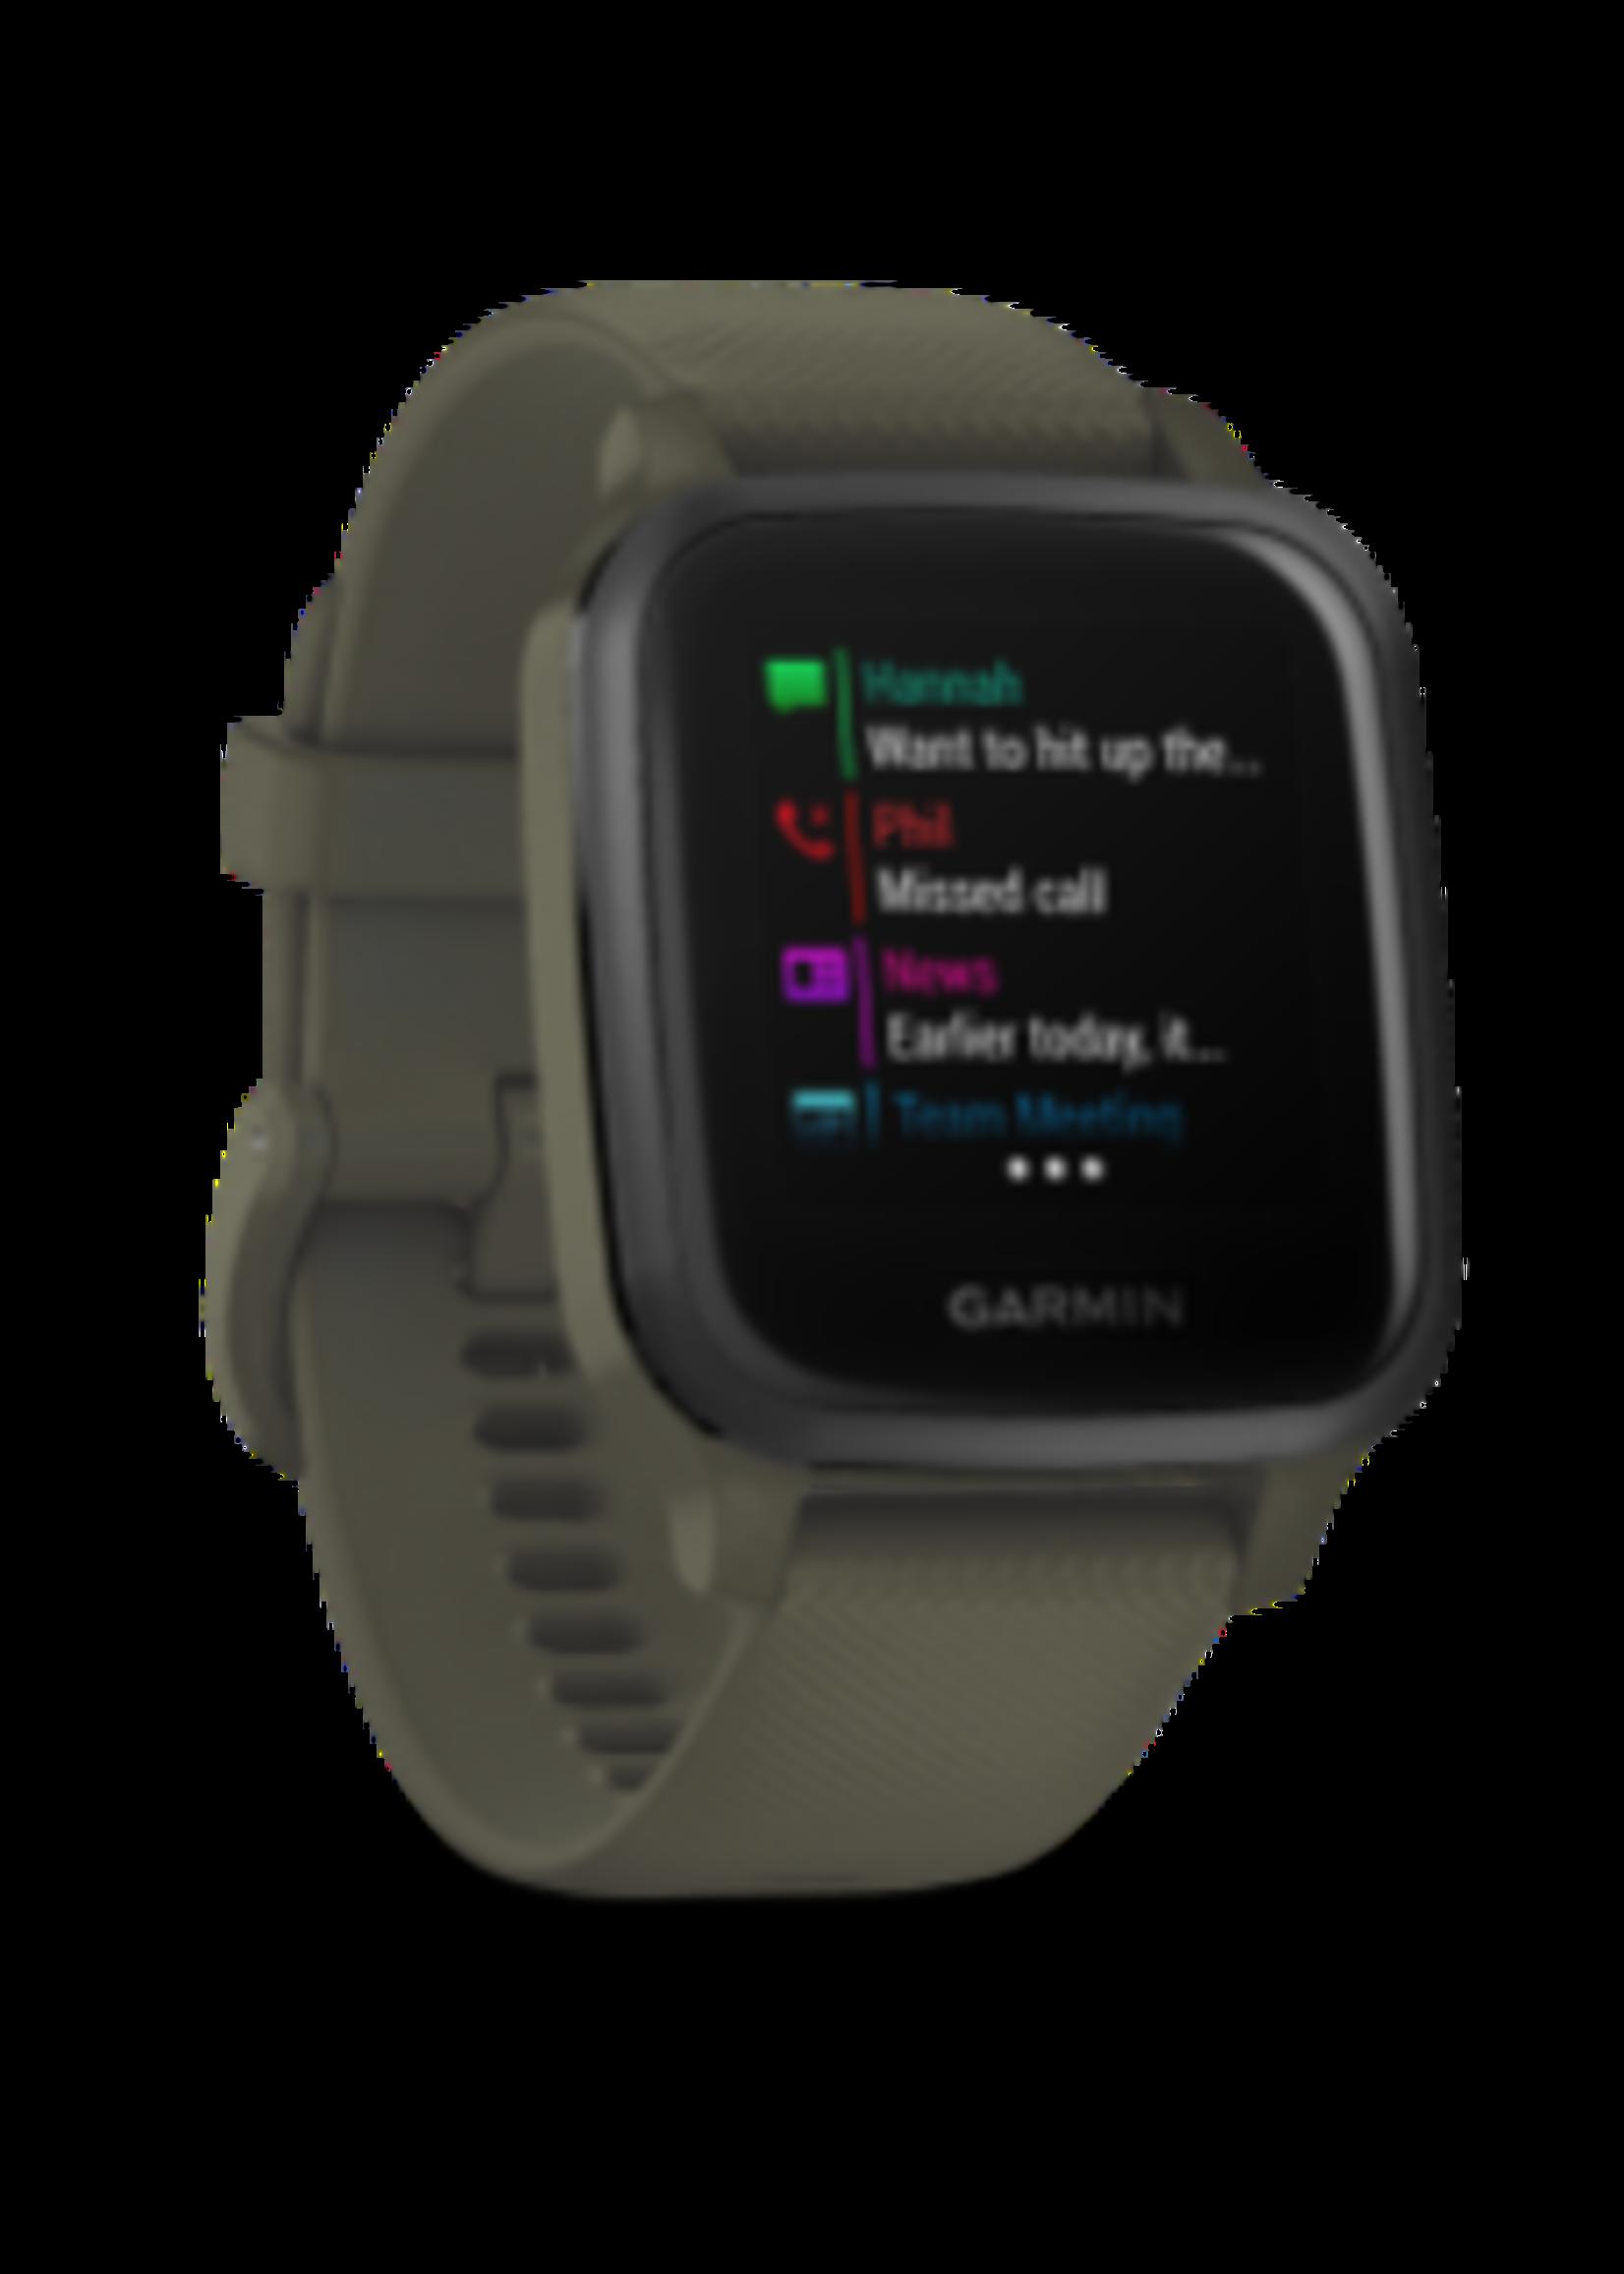 Garmin Garmin Watch Aluminum with Moss Case / Silicone Band